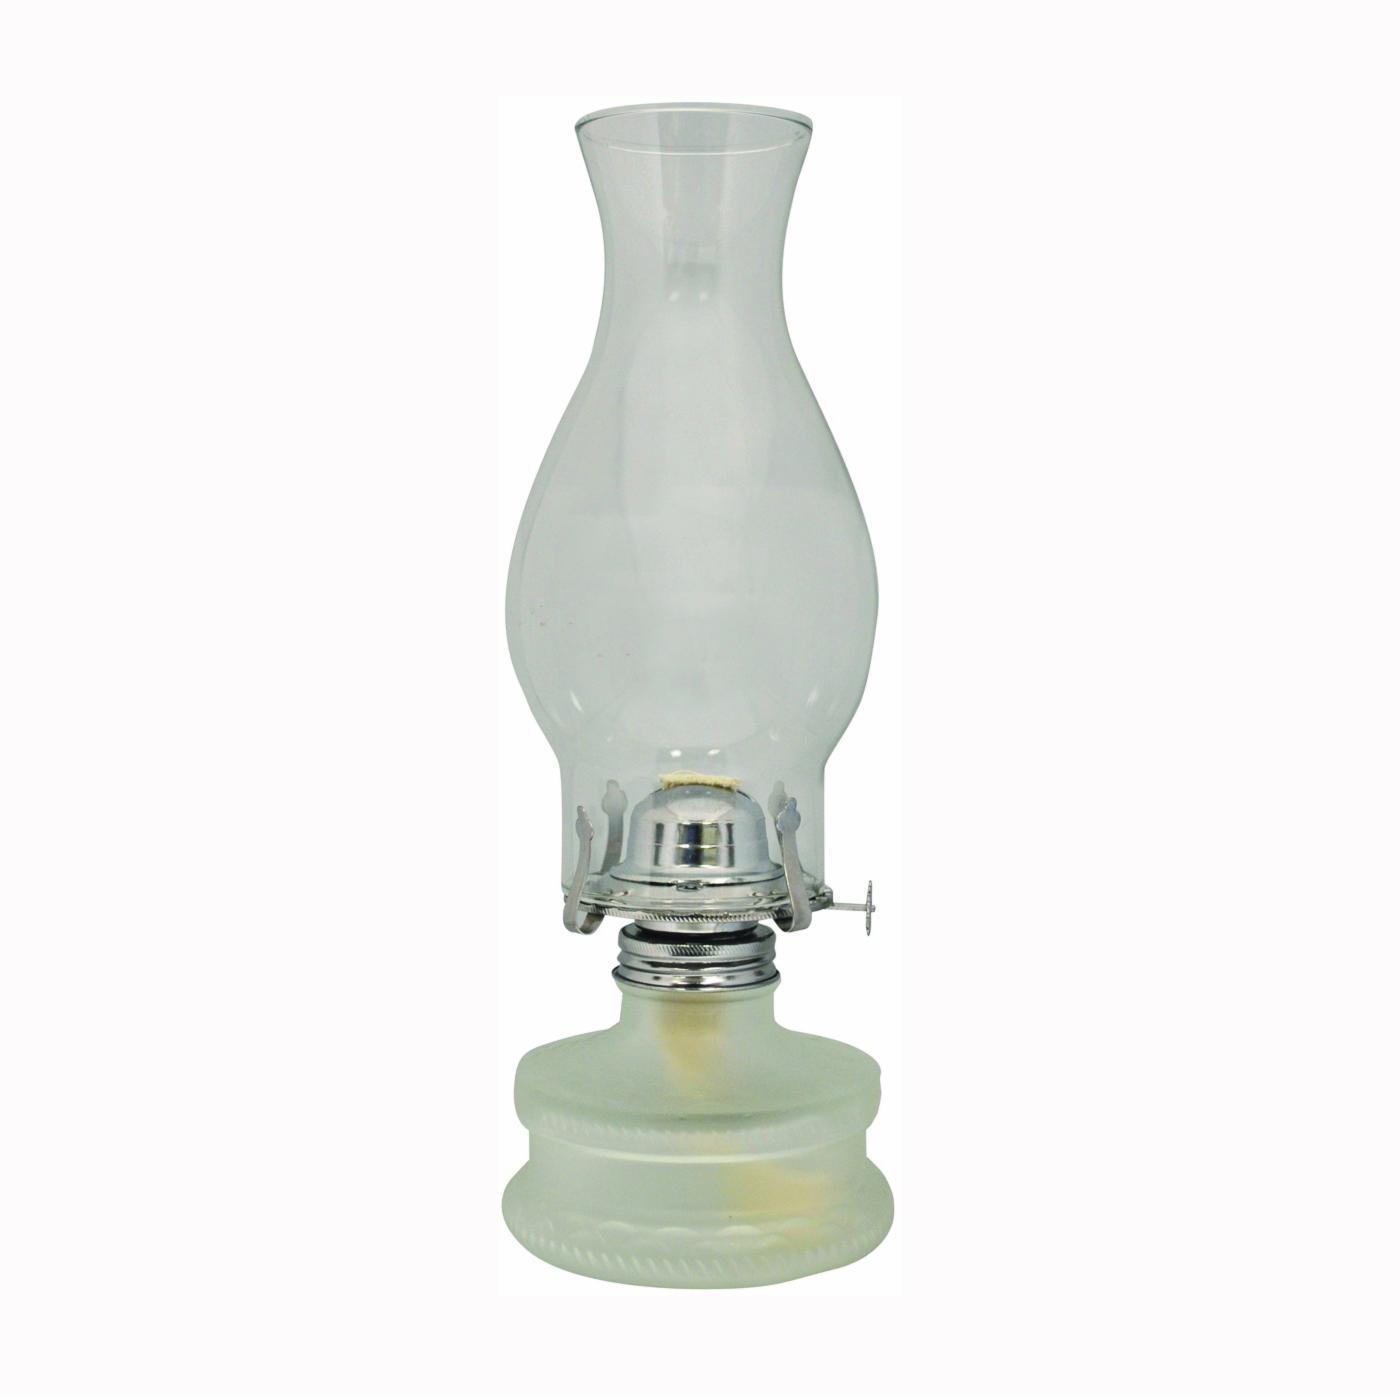 Lamplight 22300